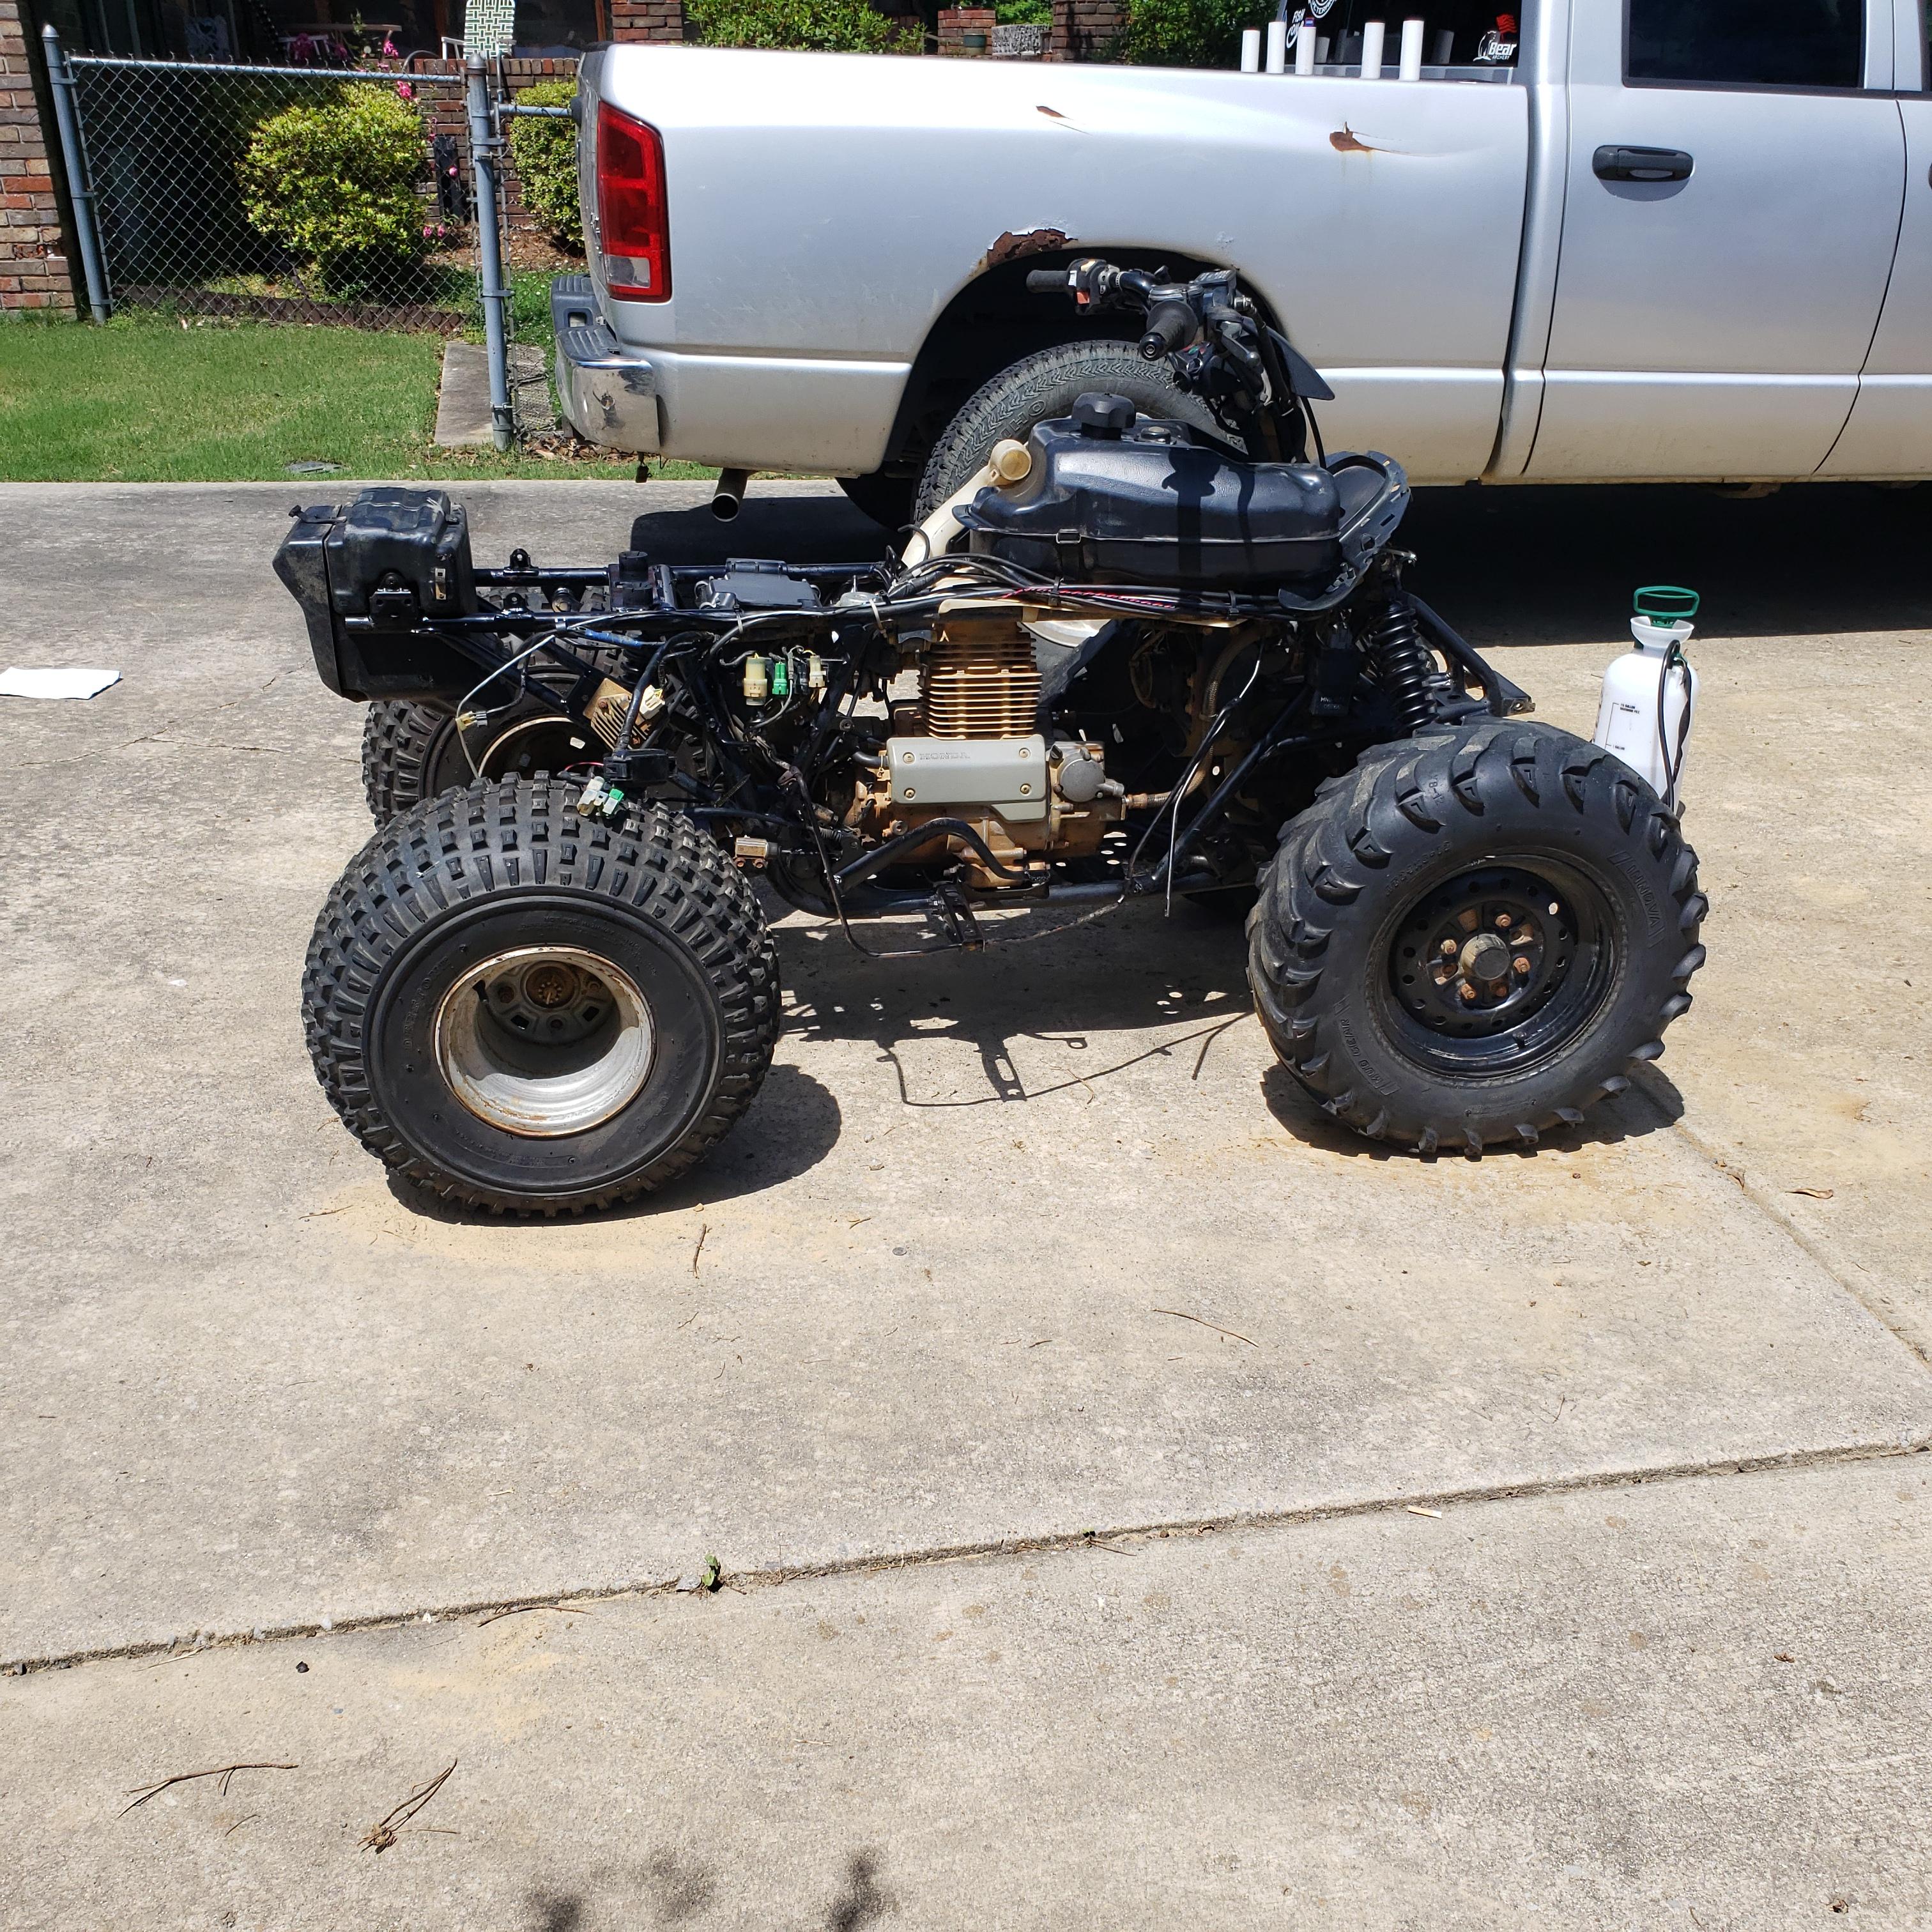 2005 Honda rancher 350 4x4 front drive shaft help-20190506_141157_1557504963331.jpg